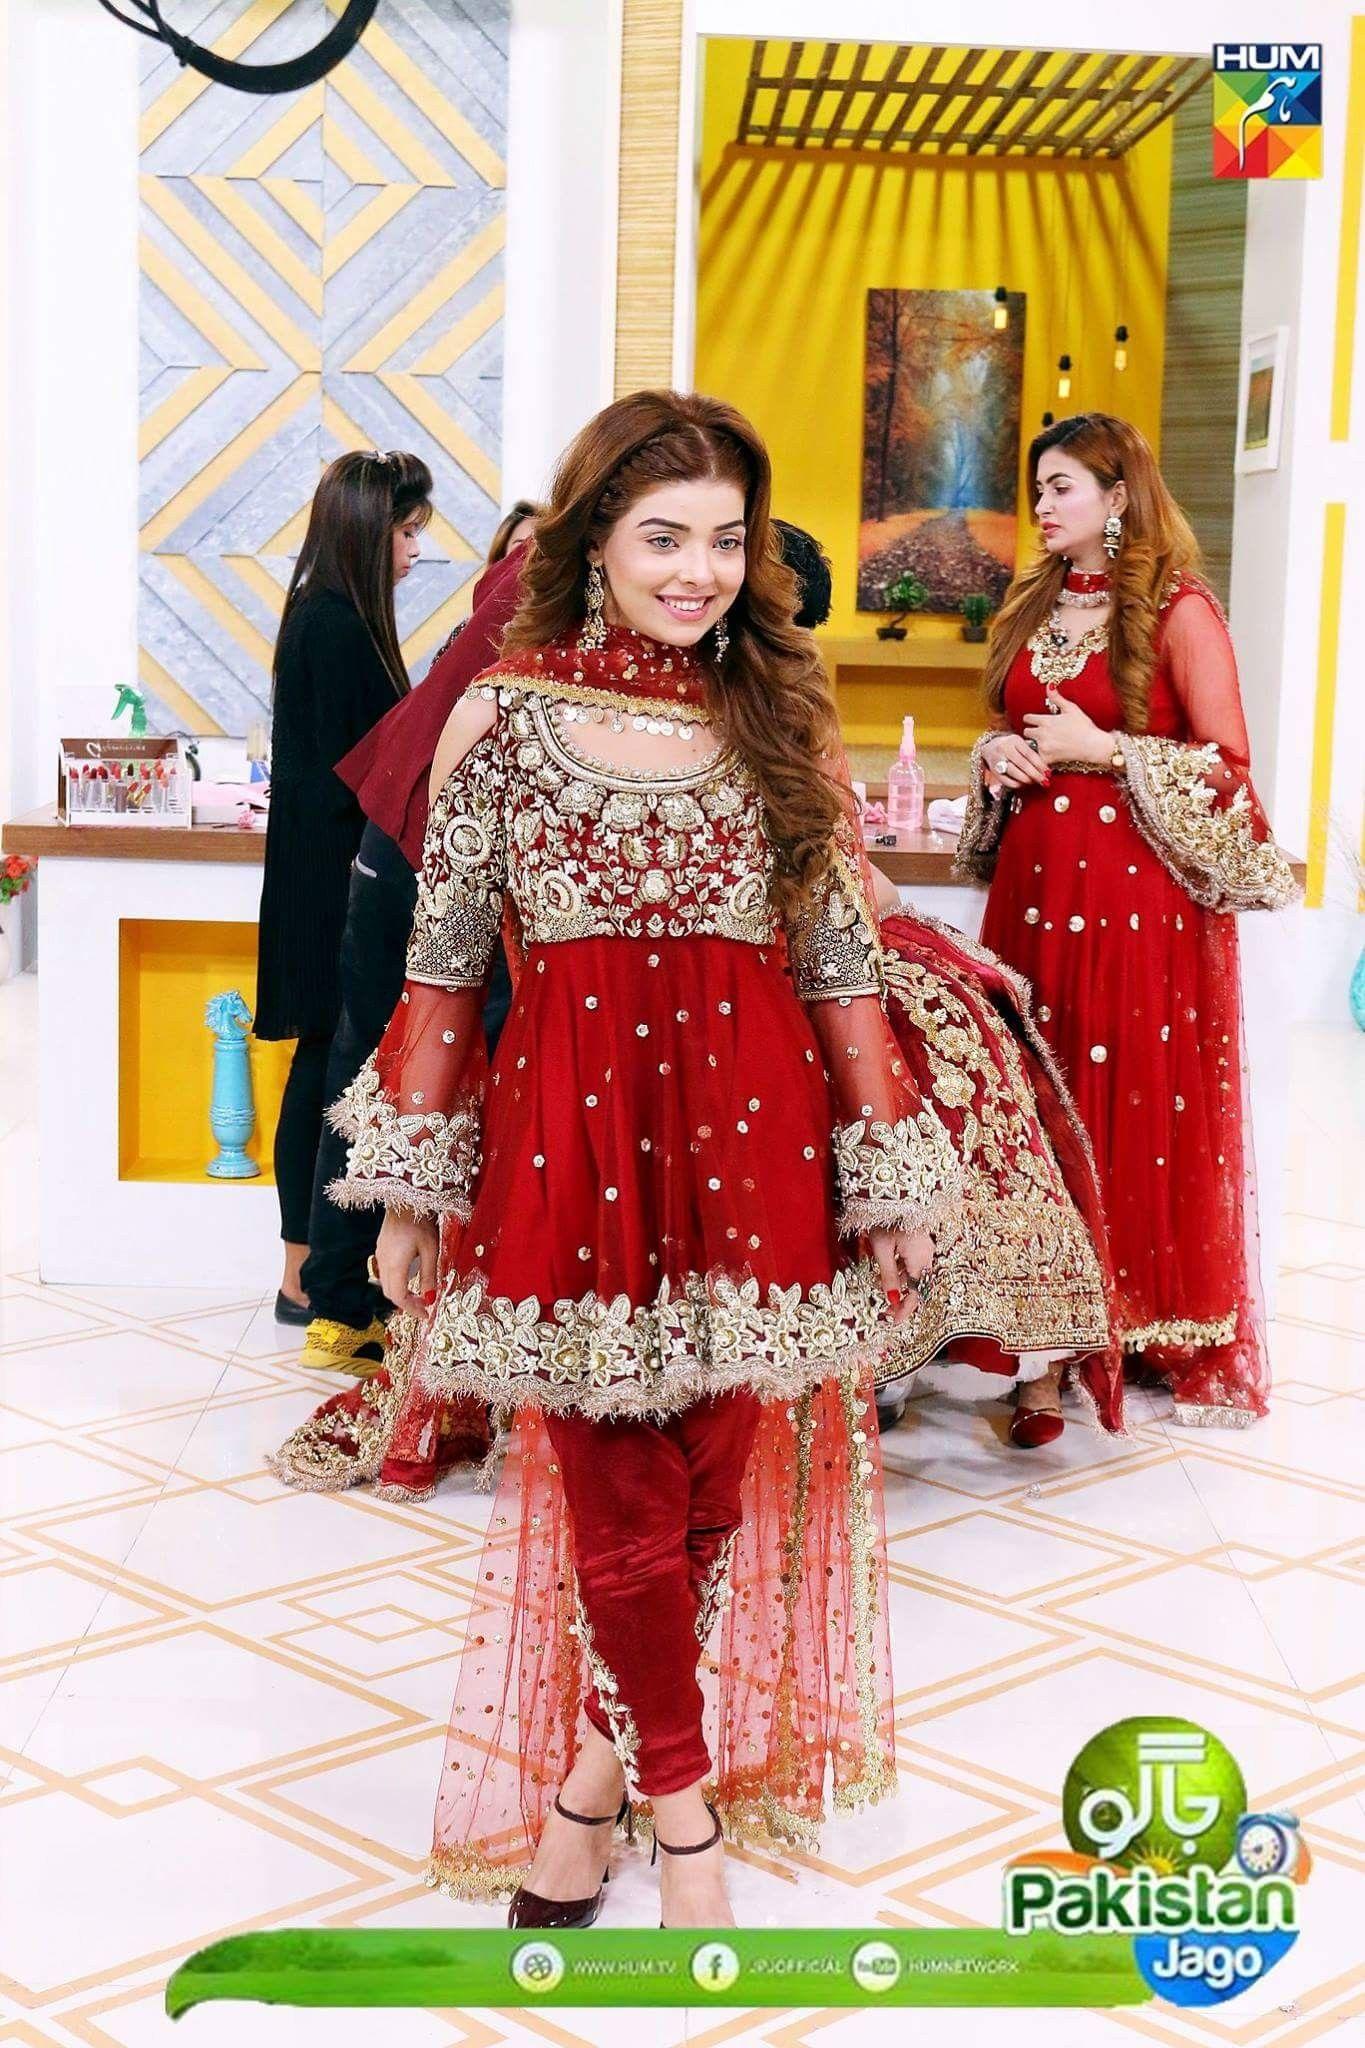 Pin von Meera Farooqui auf pak brides | Pinterest